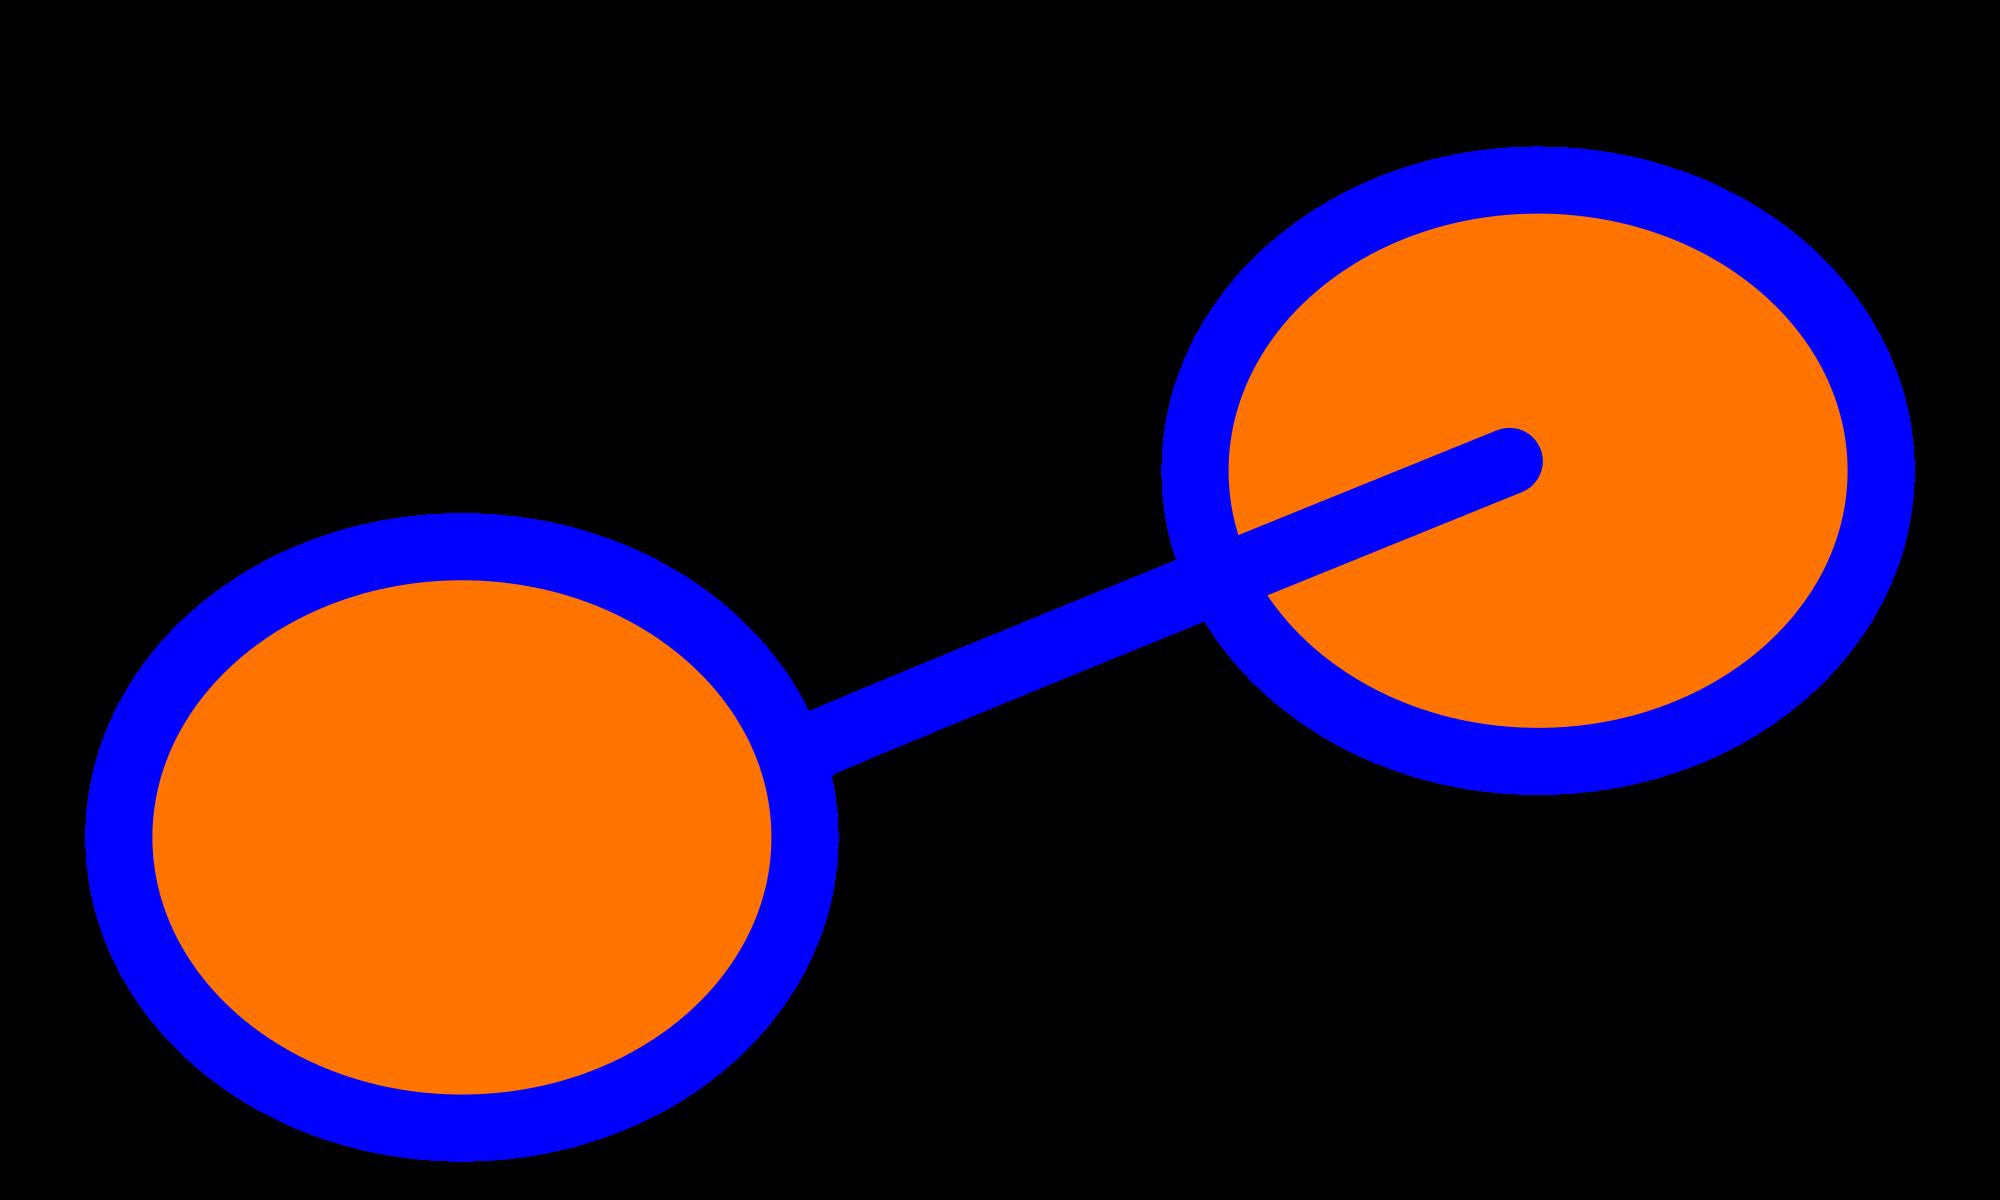 File and svg wikimedia. Wheel clipart axle